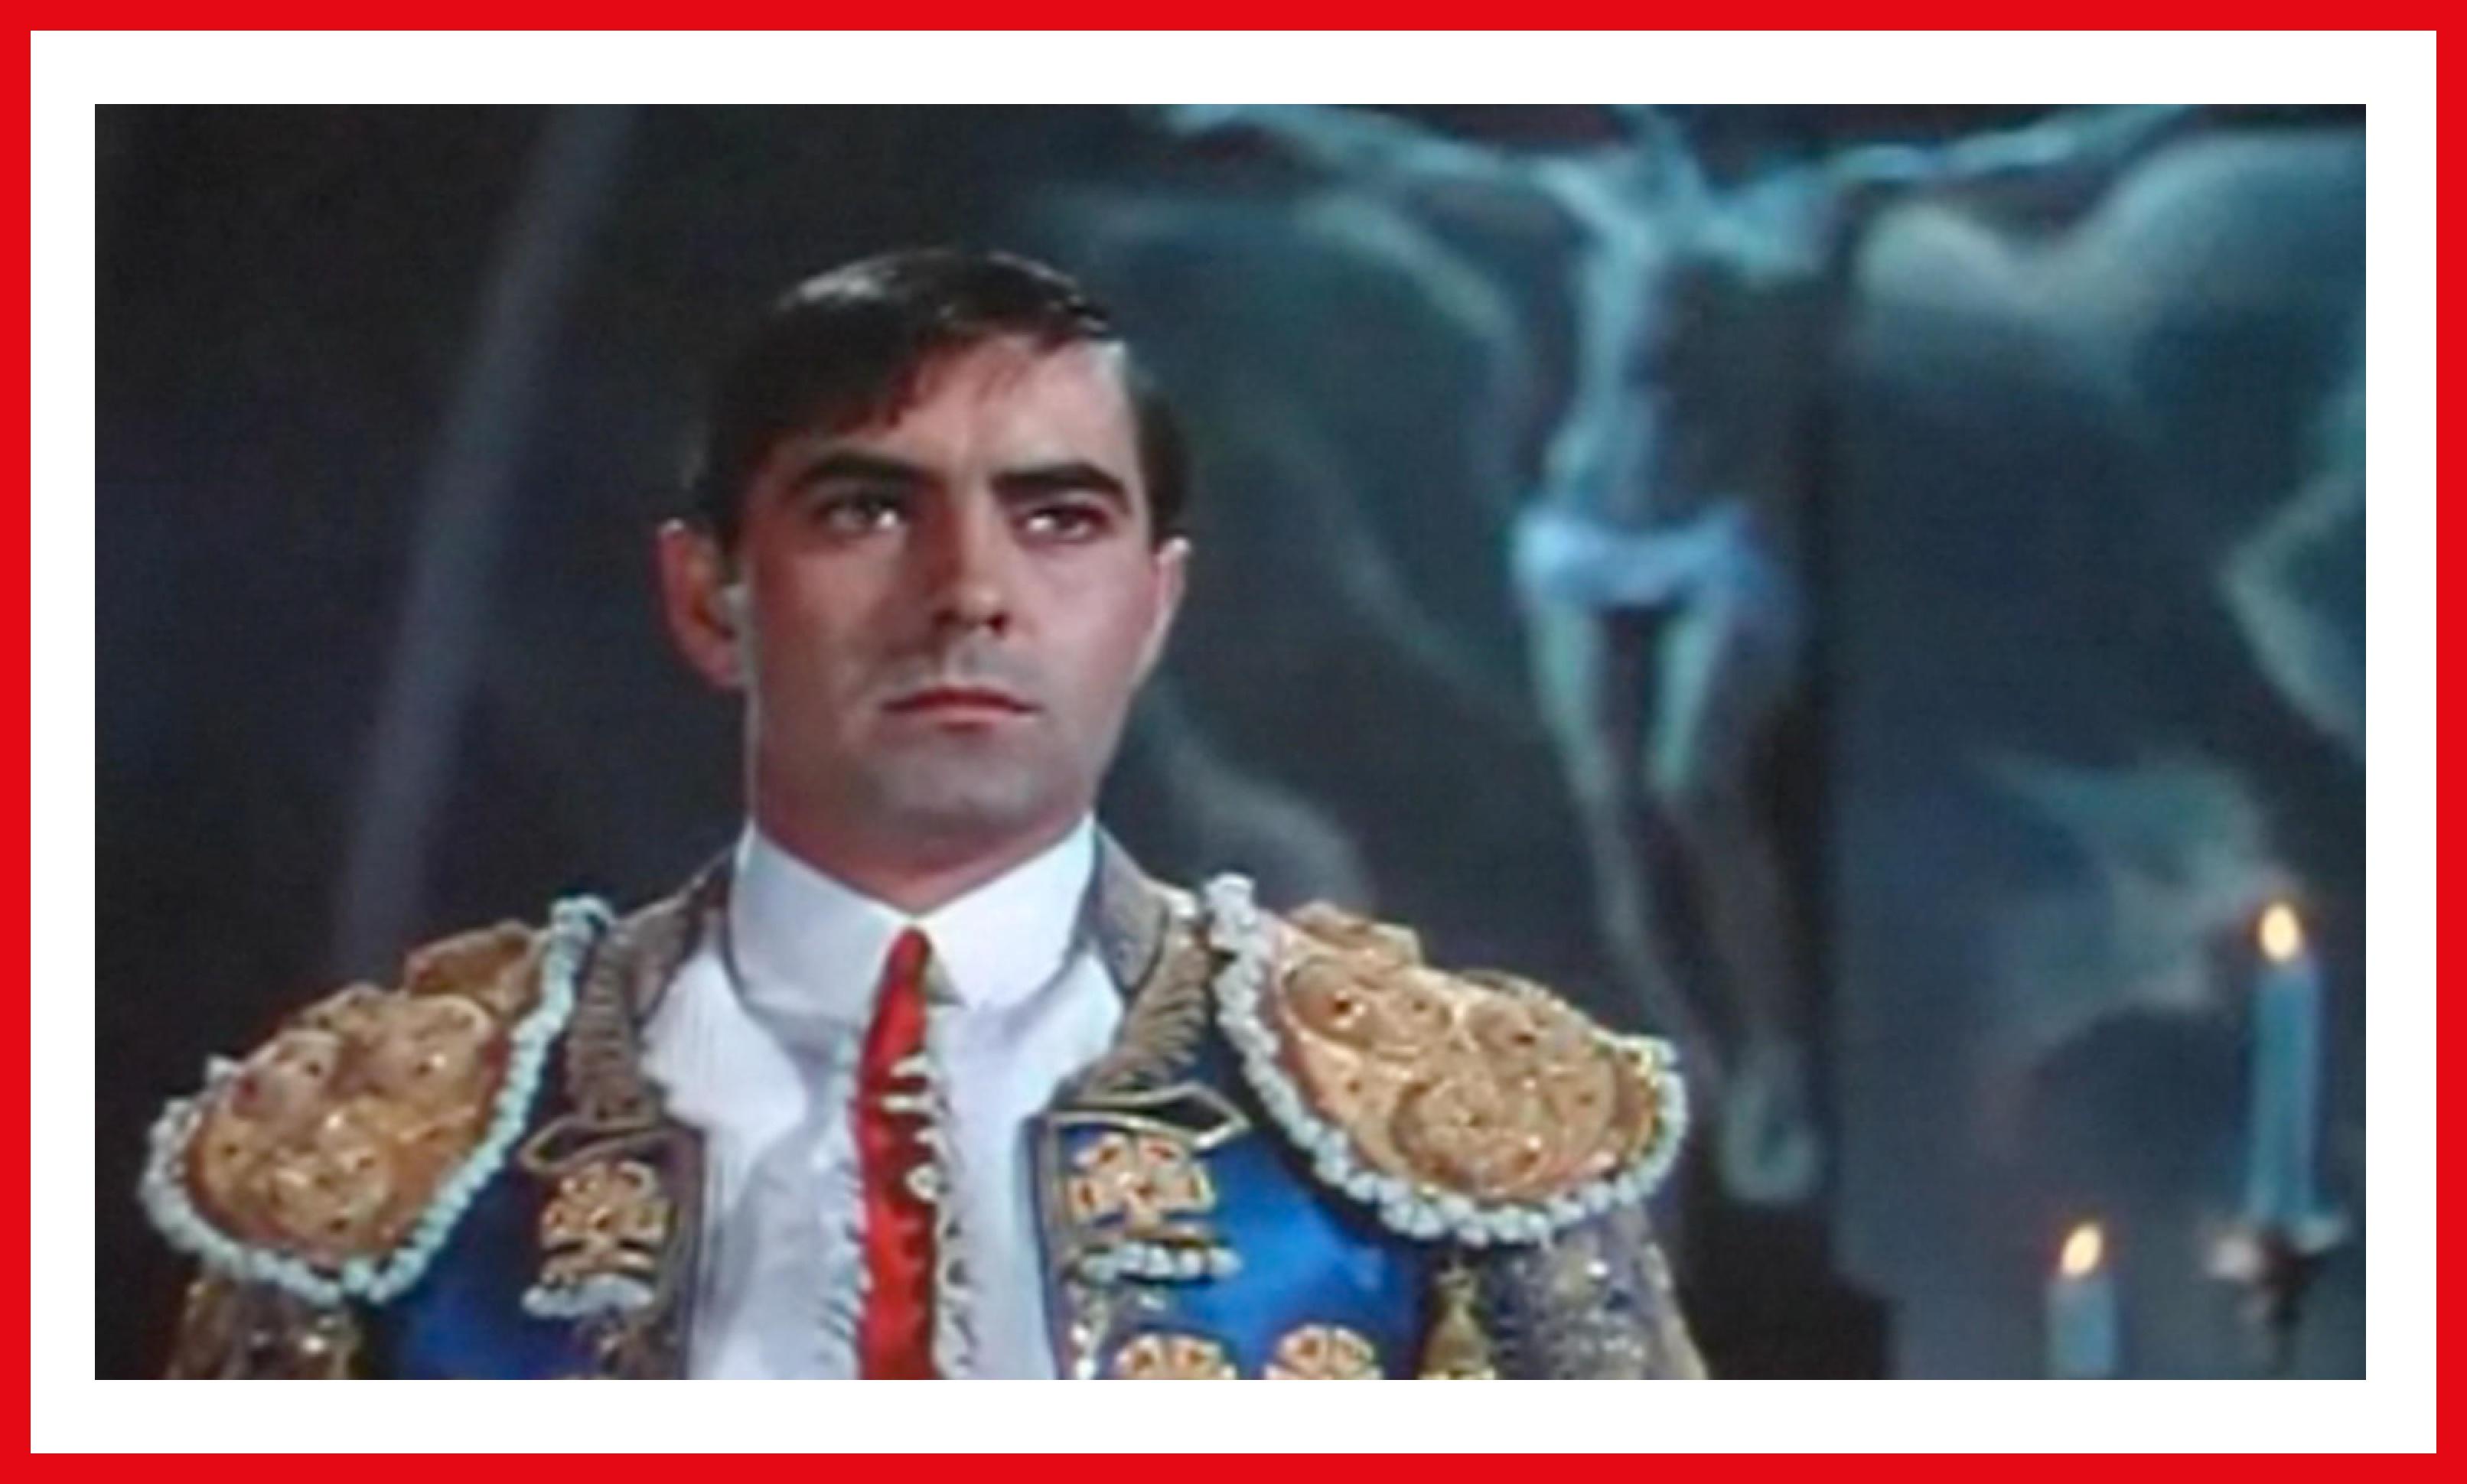 Power as Juan Gallardo, gallant in his blue and gold bullfighting costume